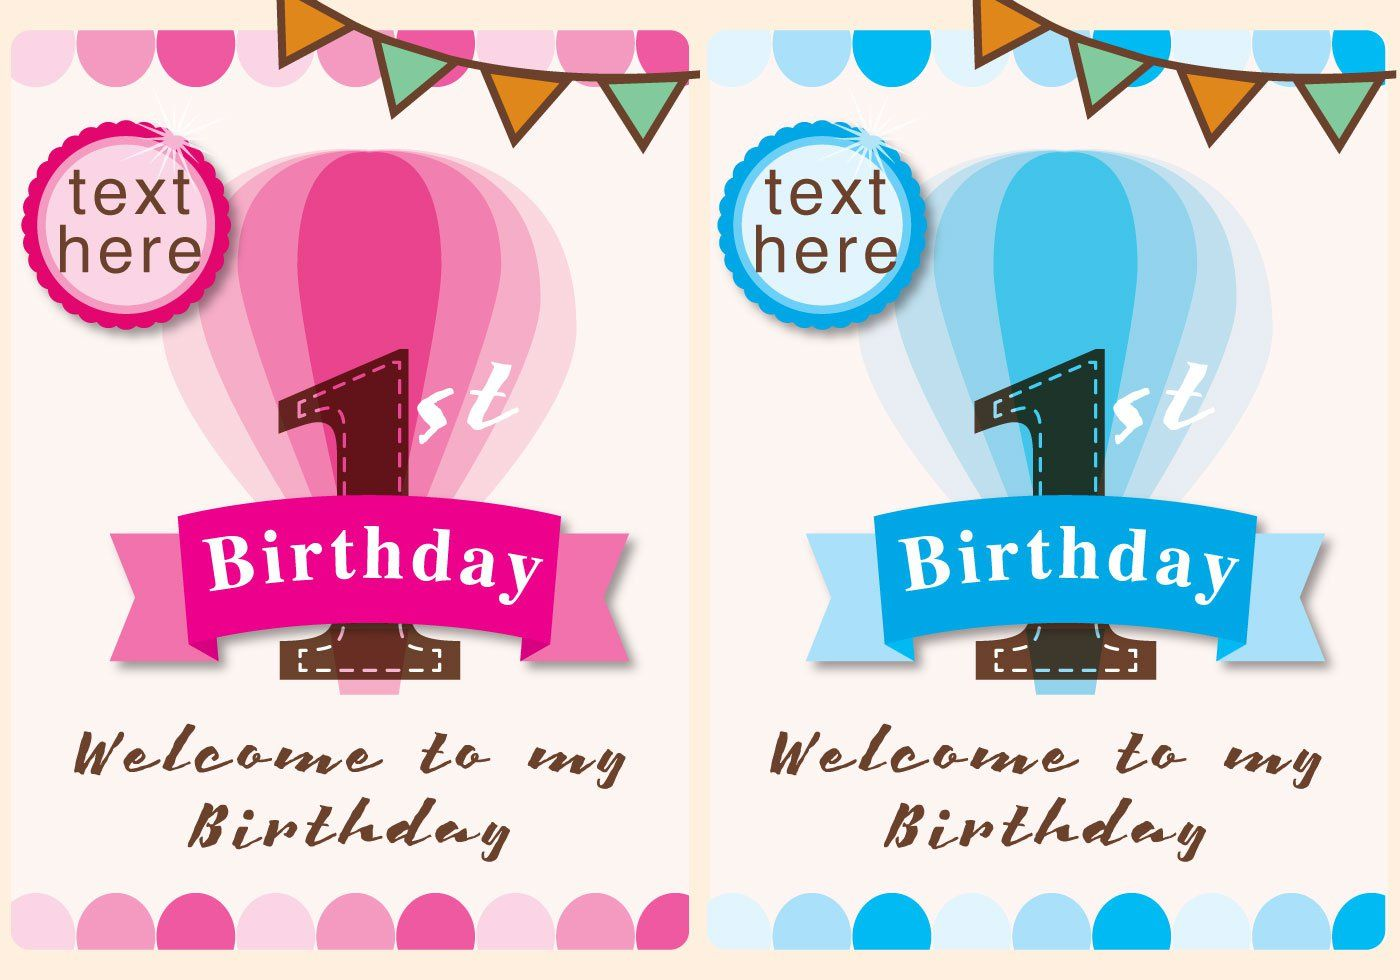 Free vector birthday invitation hg pinterest birthday 916db546e77645f7745b4edbe68debeag stopboris Choice Image